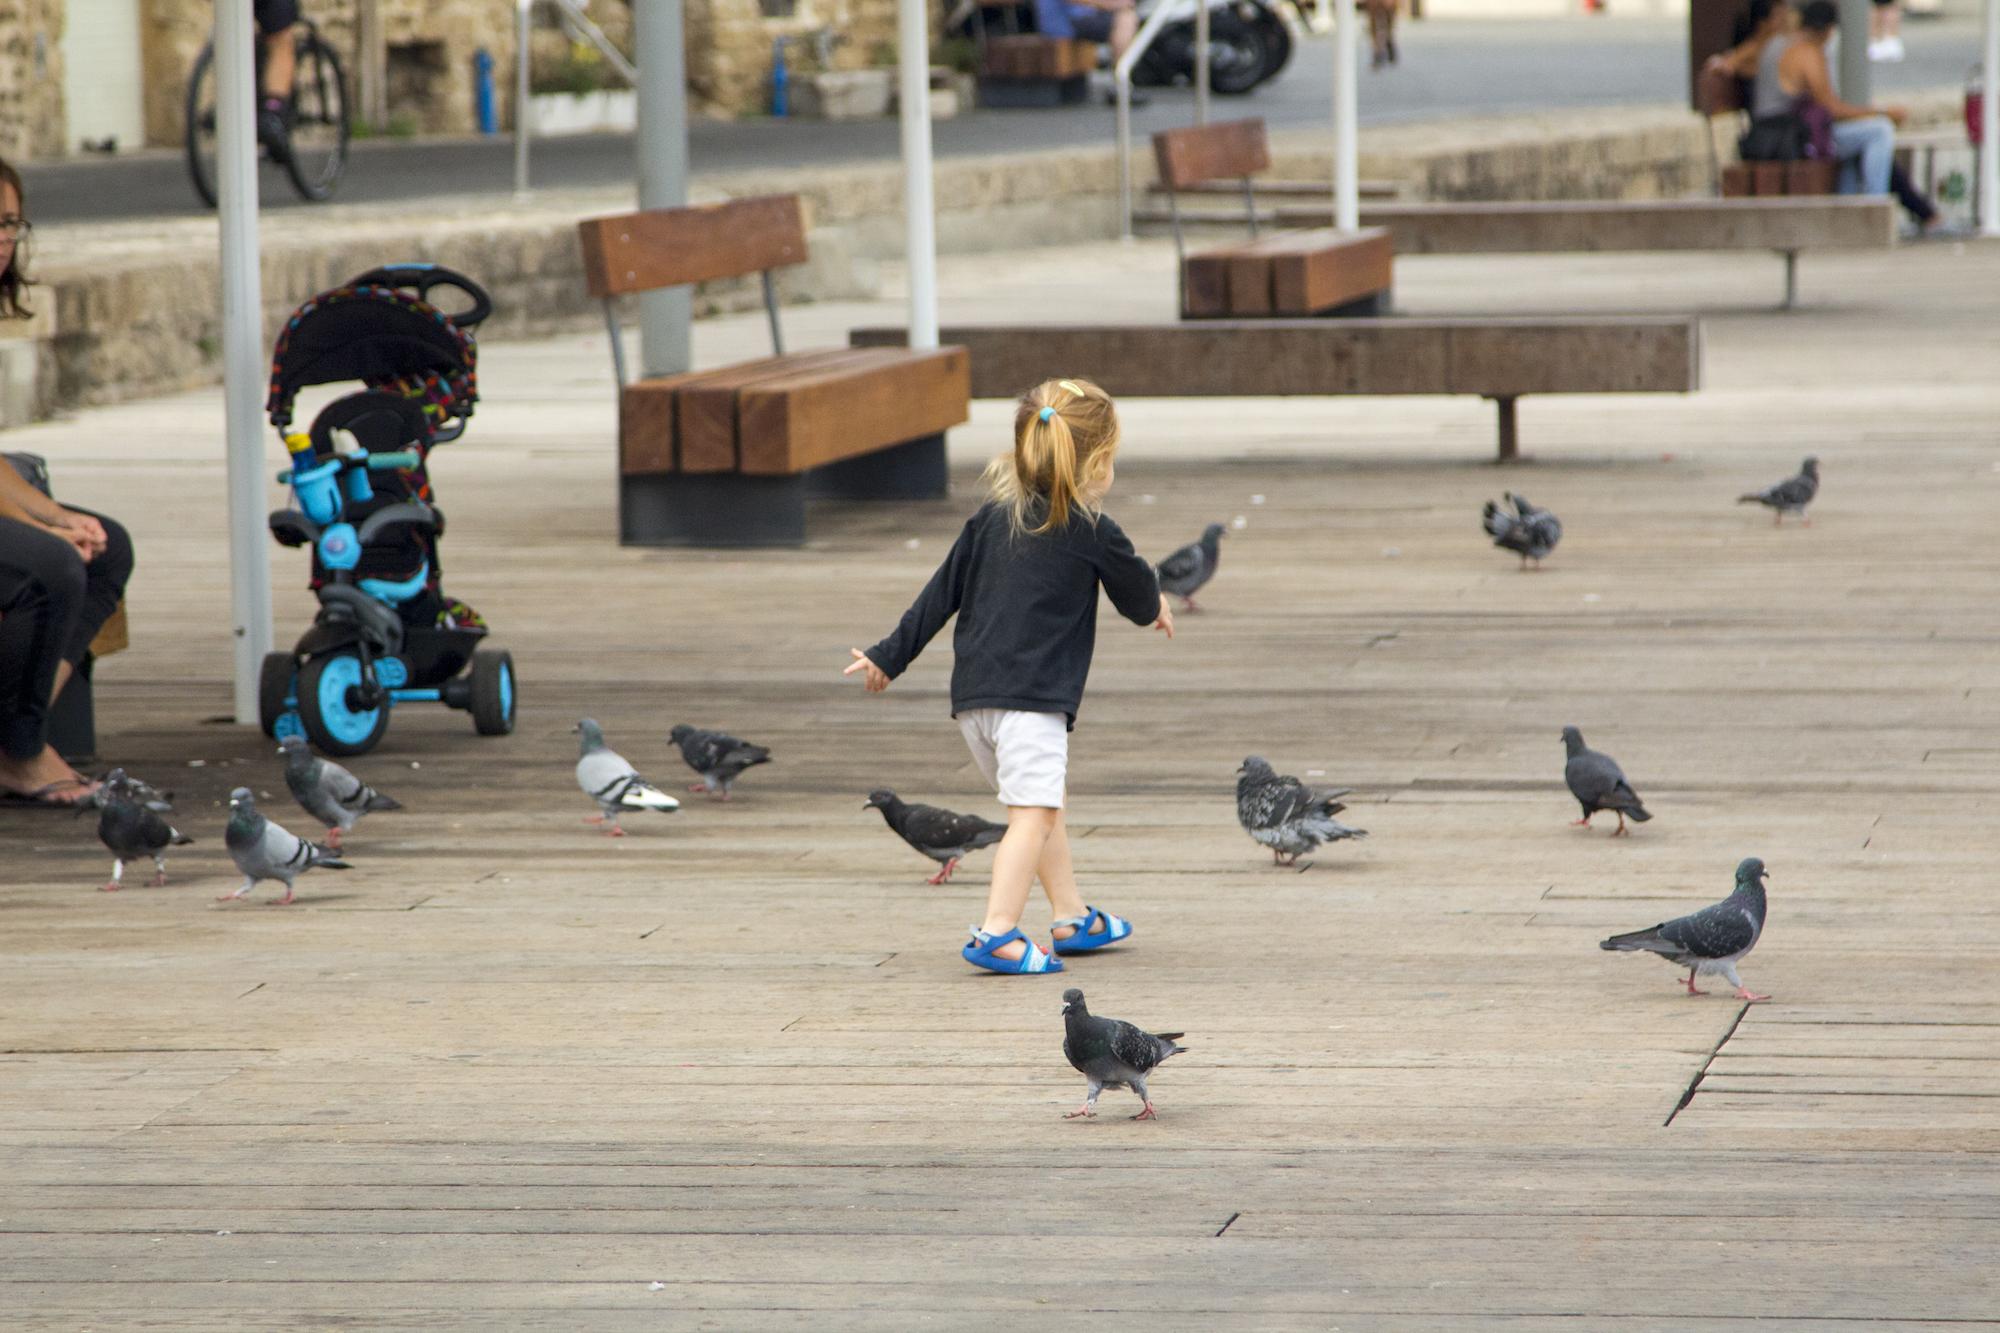 The pier at Old Jaffa in Tel Aviv, Israel. #Travel photography by Geena Matuson @geenamatuson #thegirlmirage.